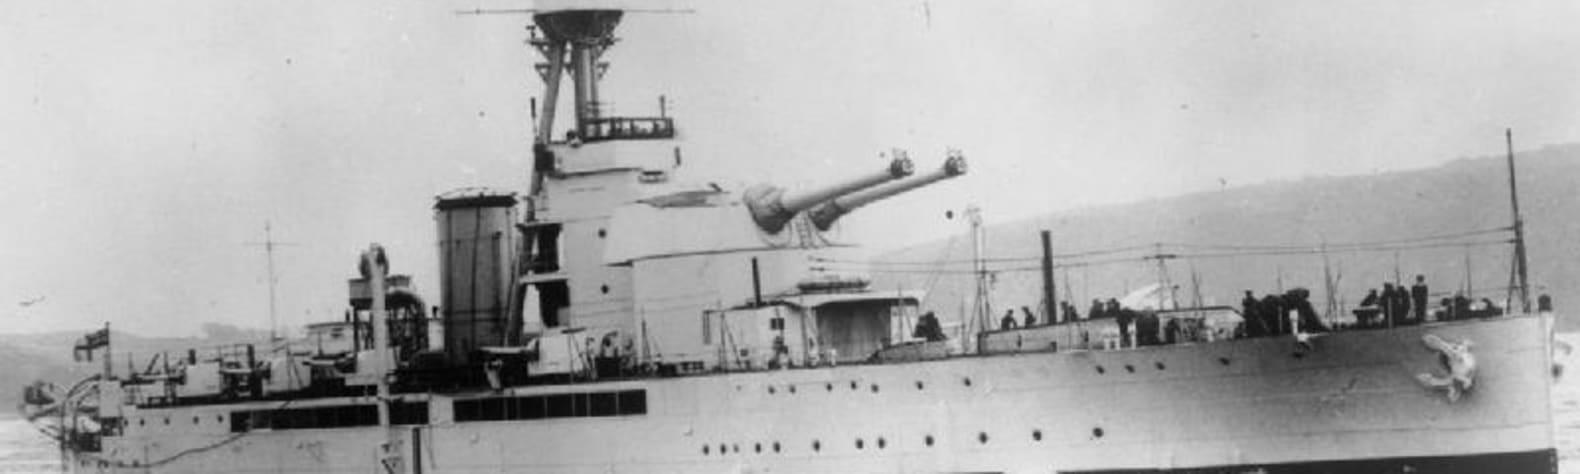 Wrecks of HMS Erebus and HMS Terror National Historic Site